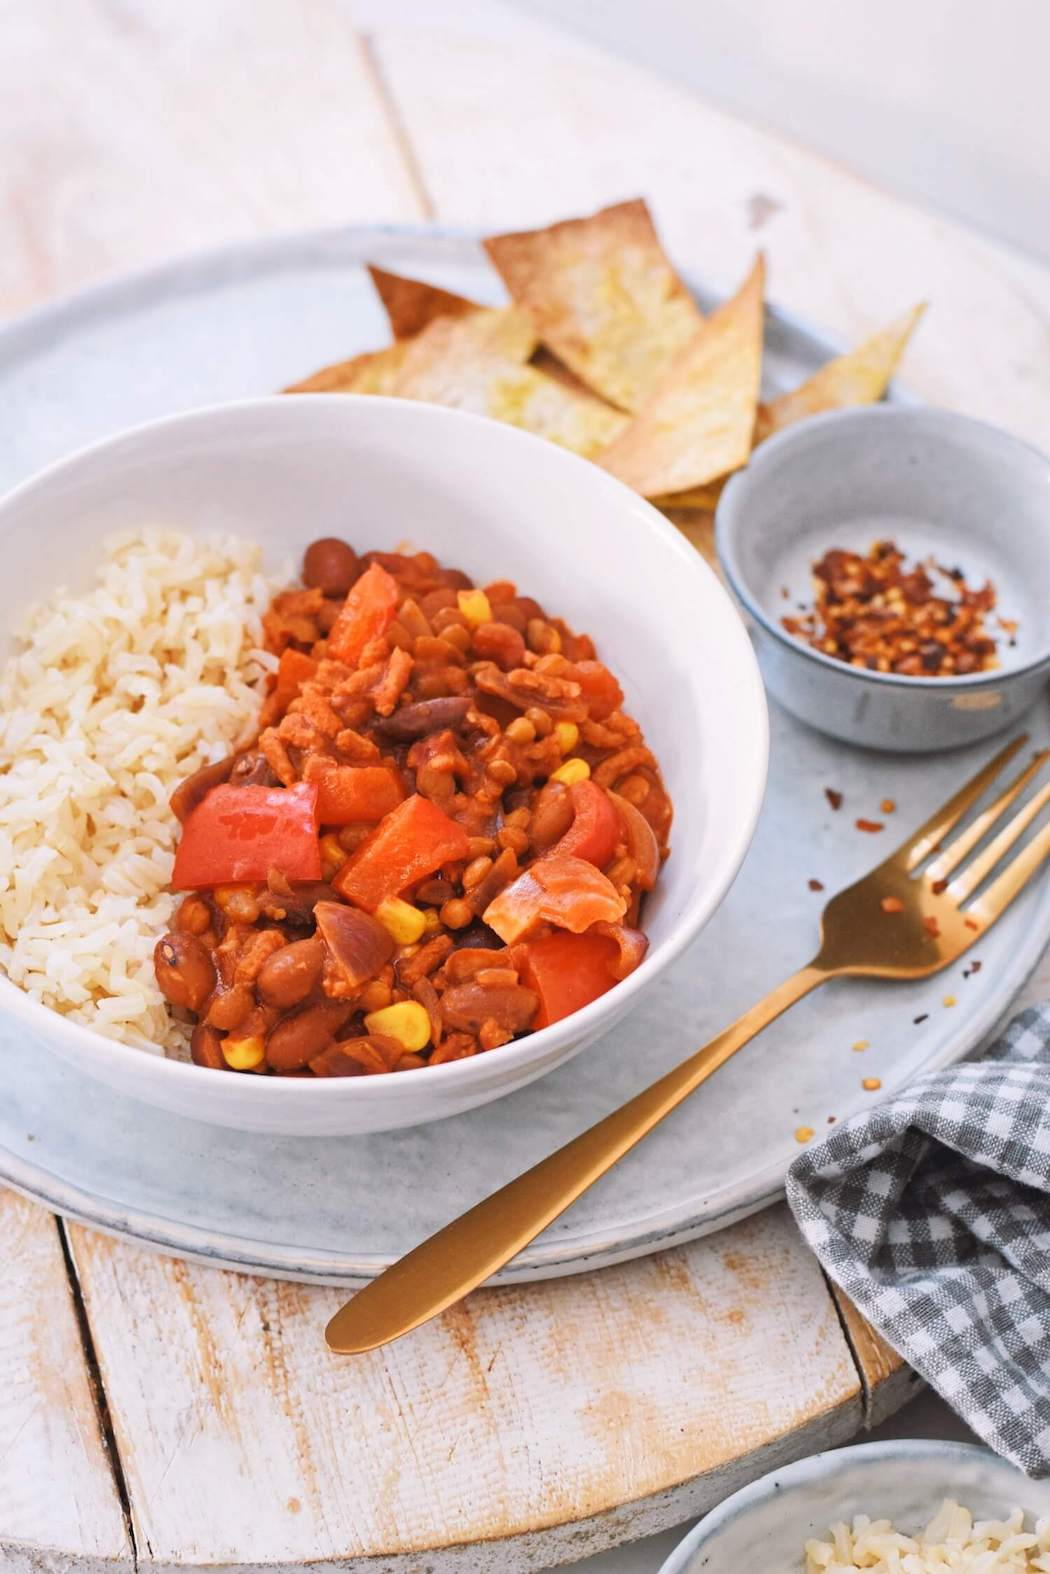 Zelfgemaakte chili sin carne recept